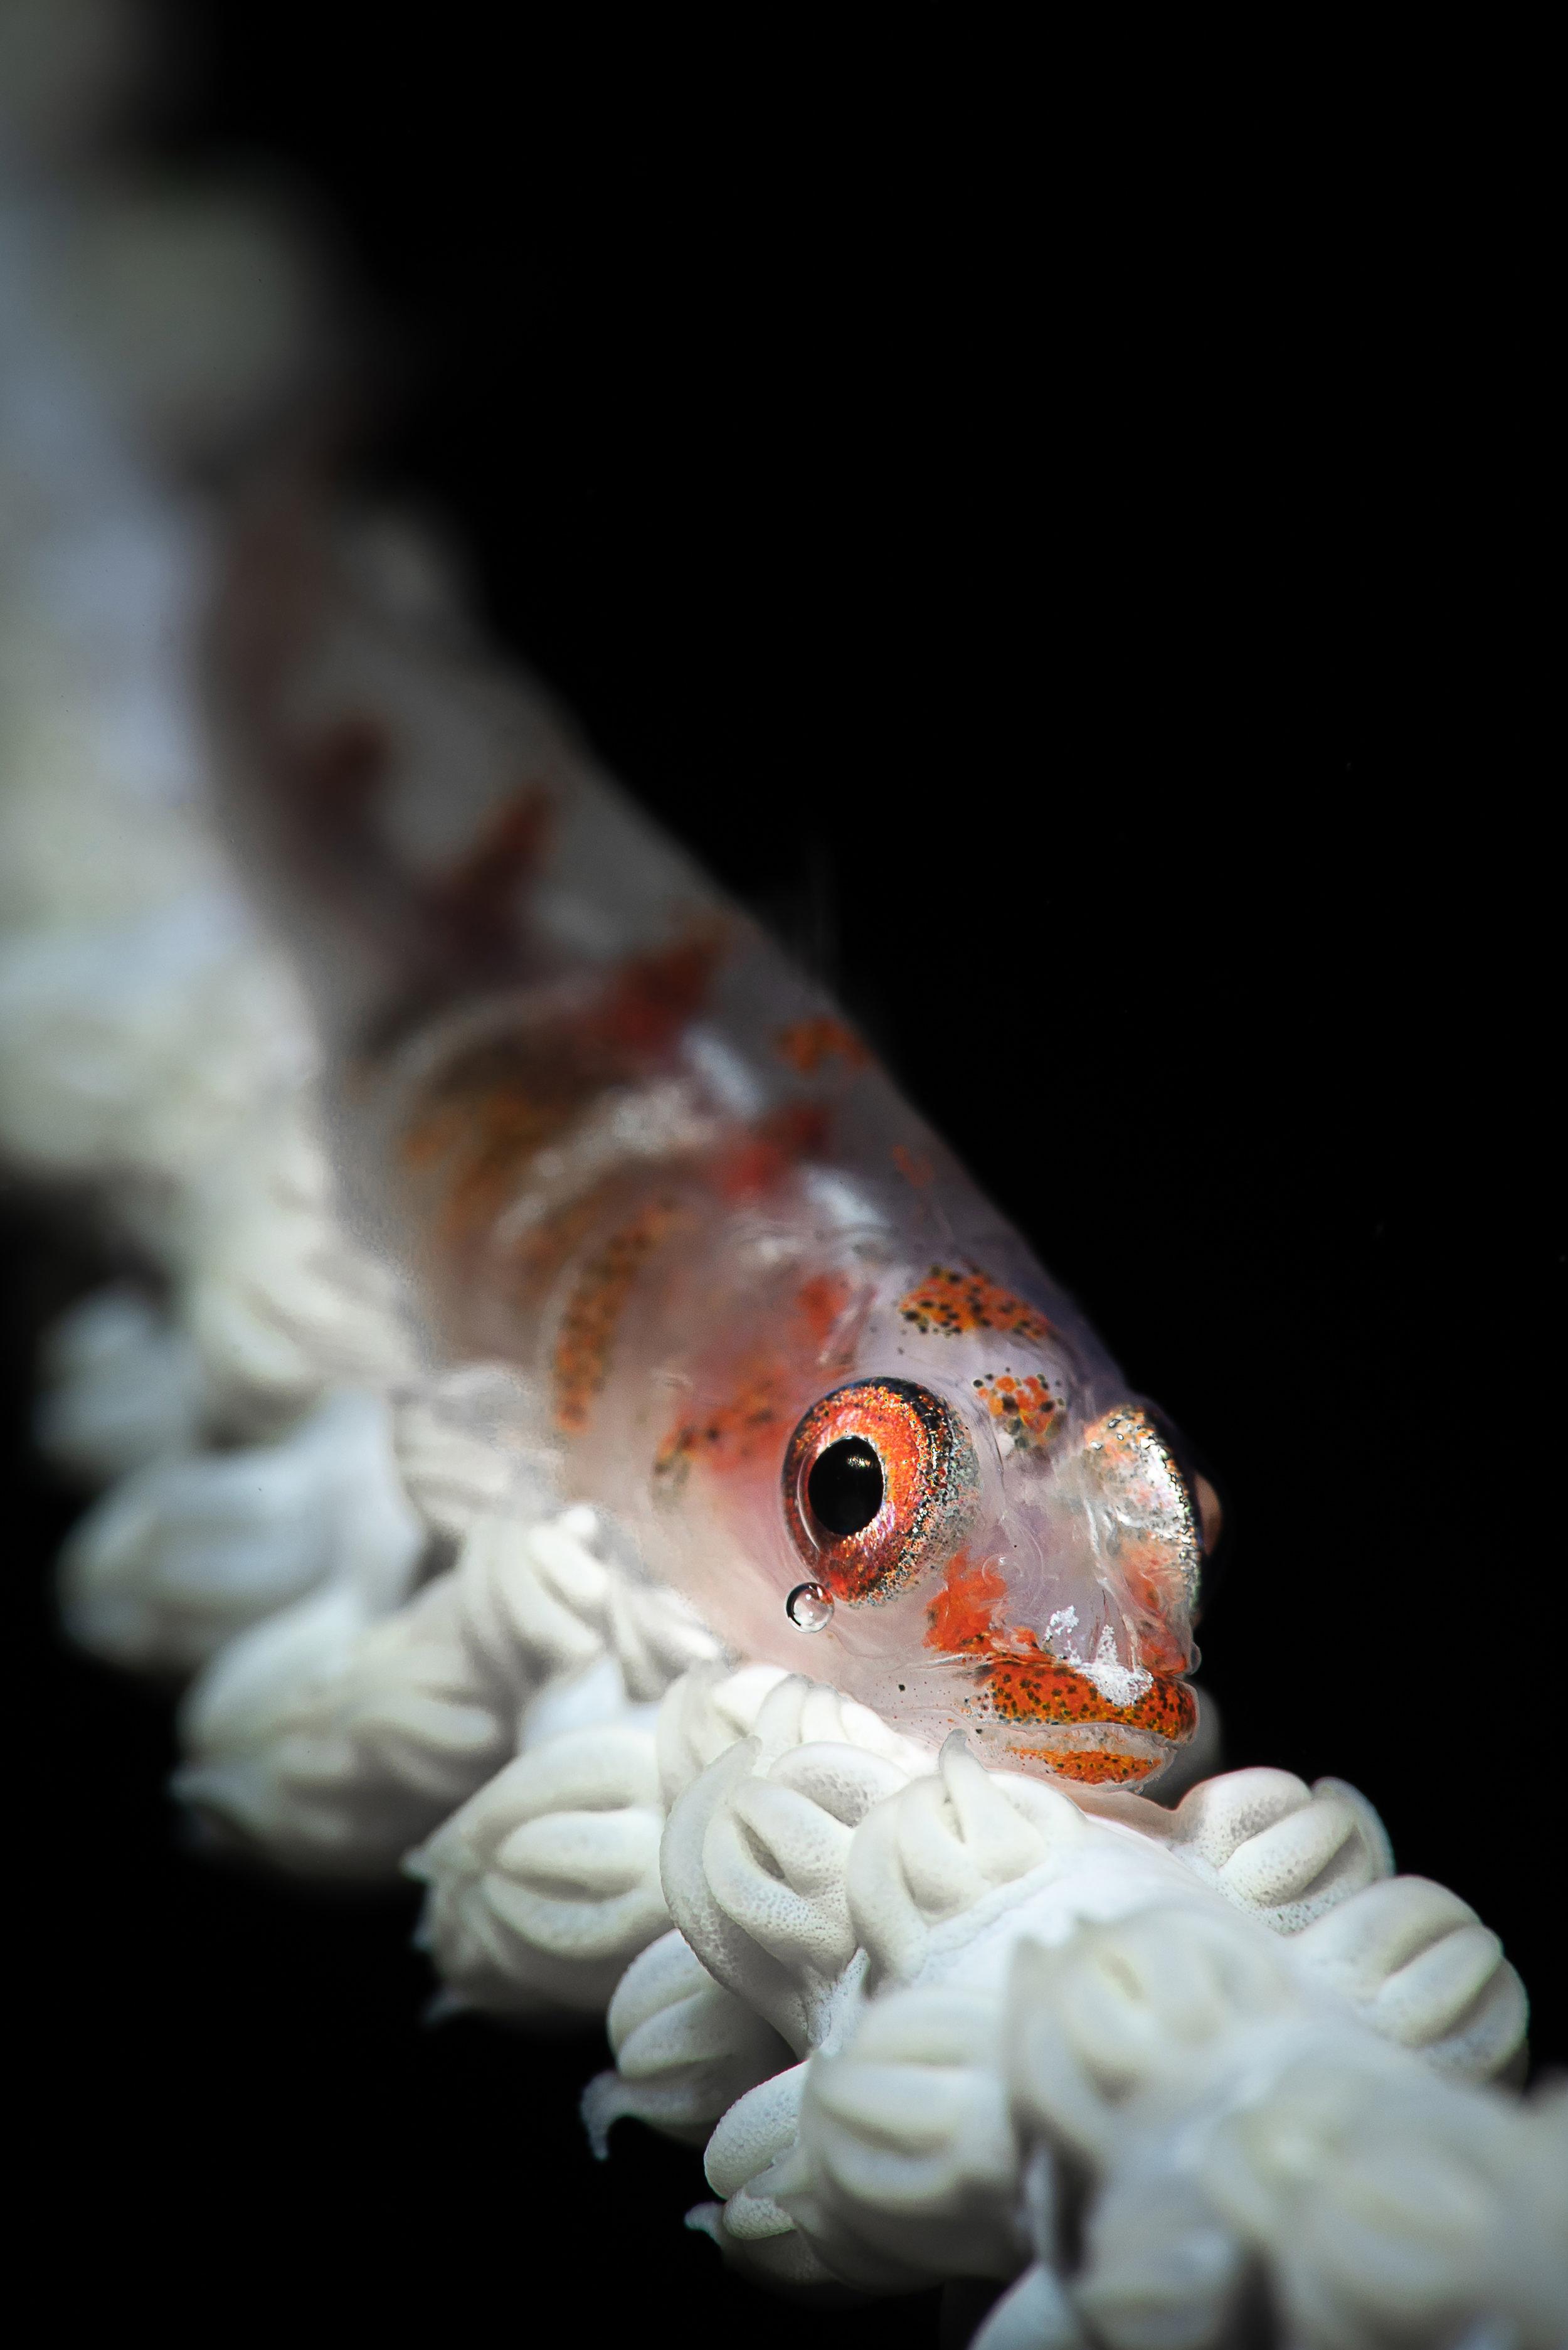 credit: François Baelen / coral reef image bank